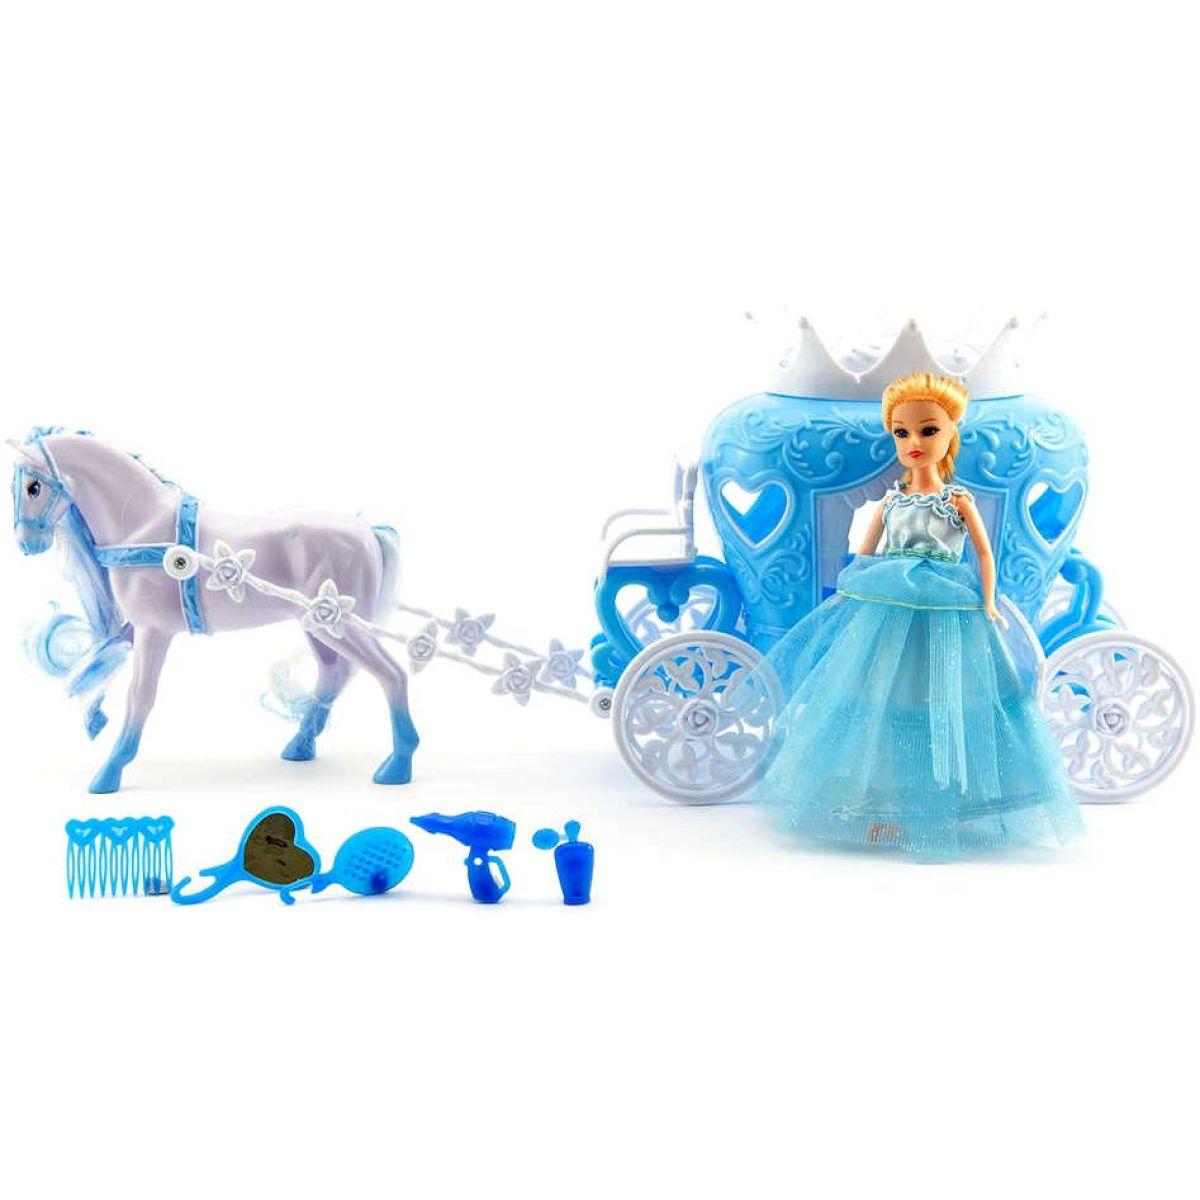 Teddies T00541901 Kůň s kočárem + doplňky plast 40 cm